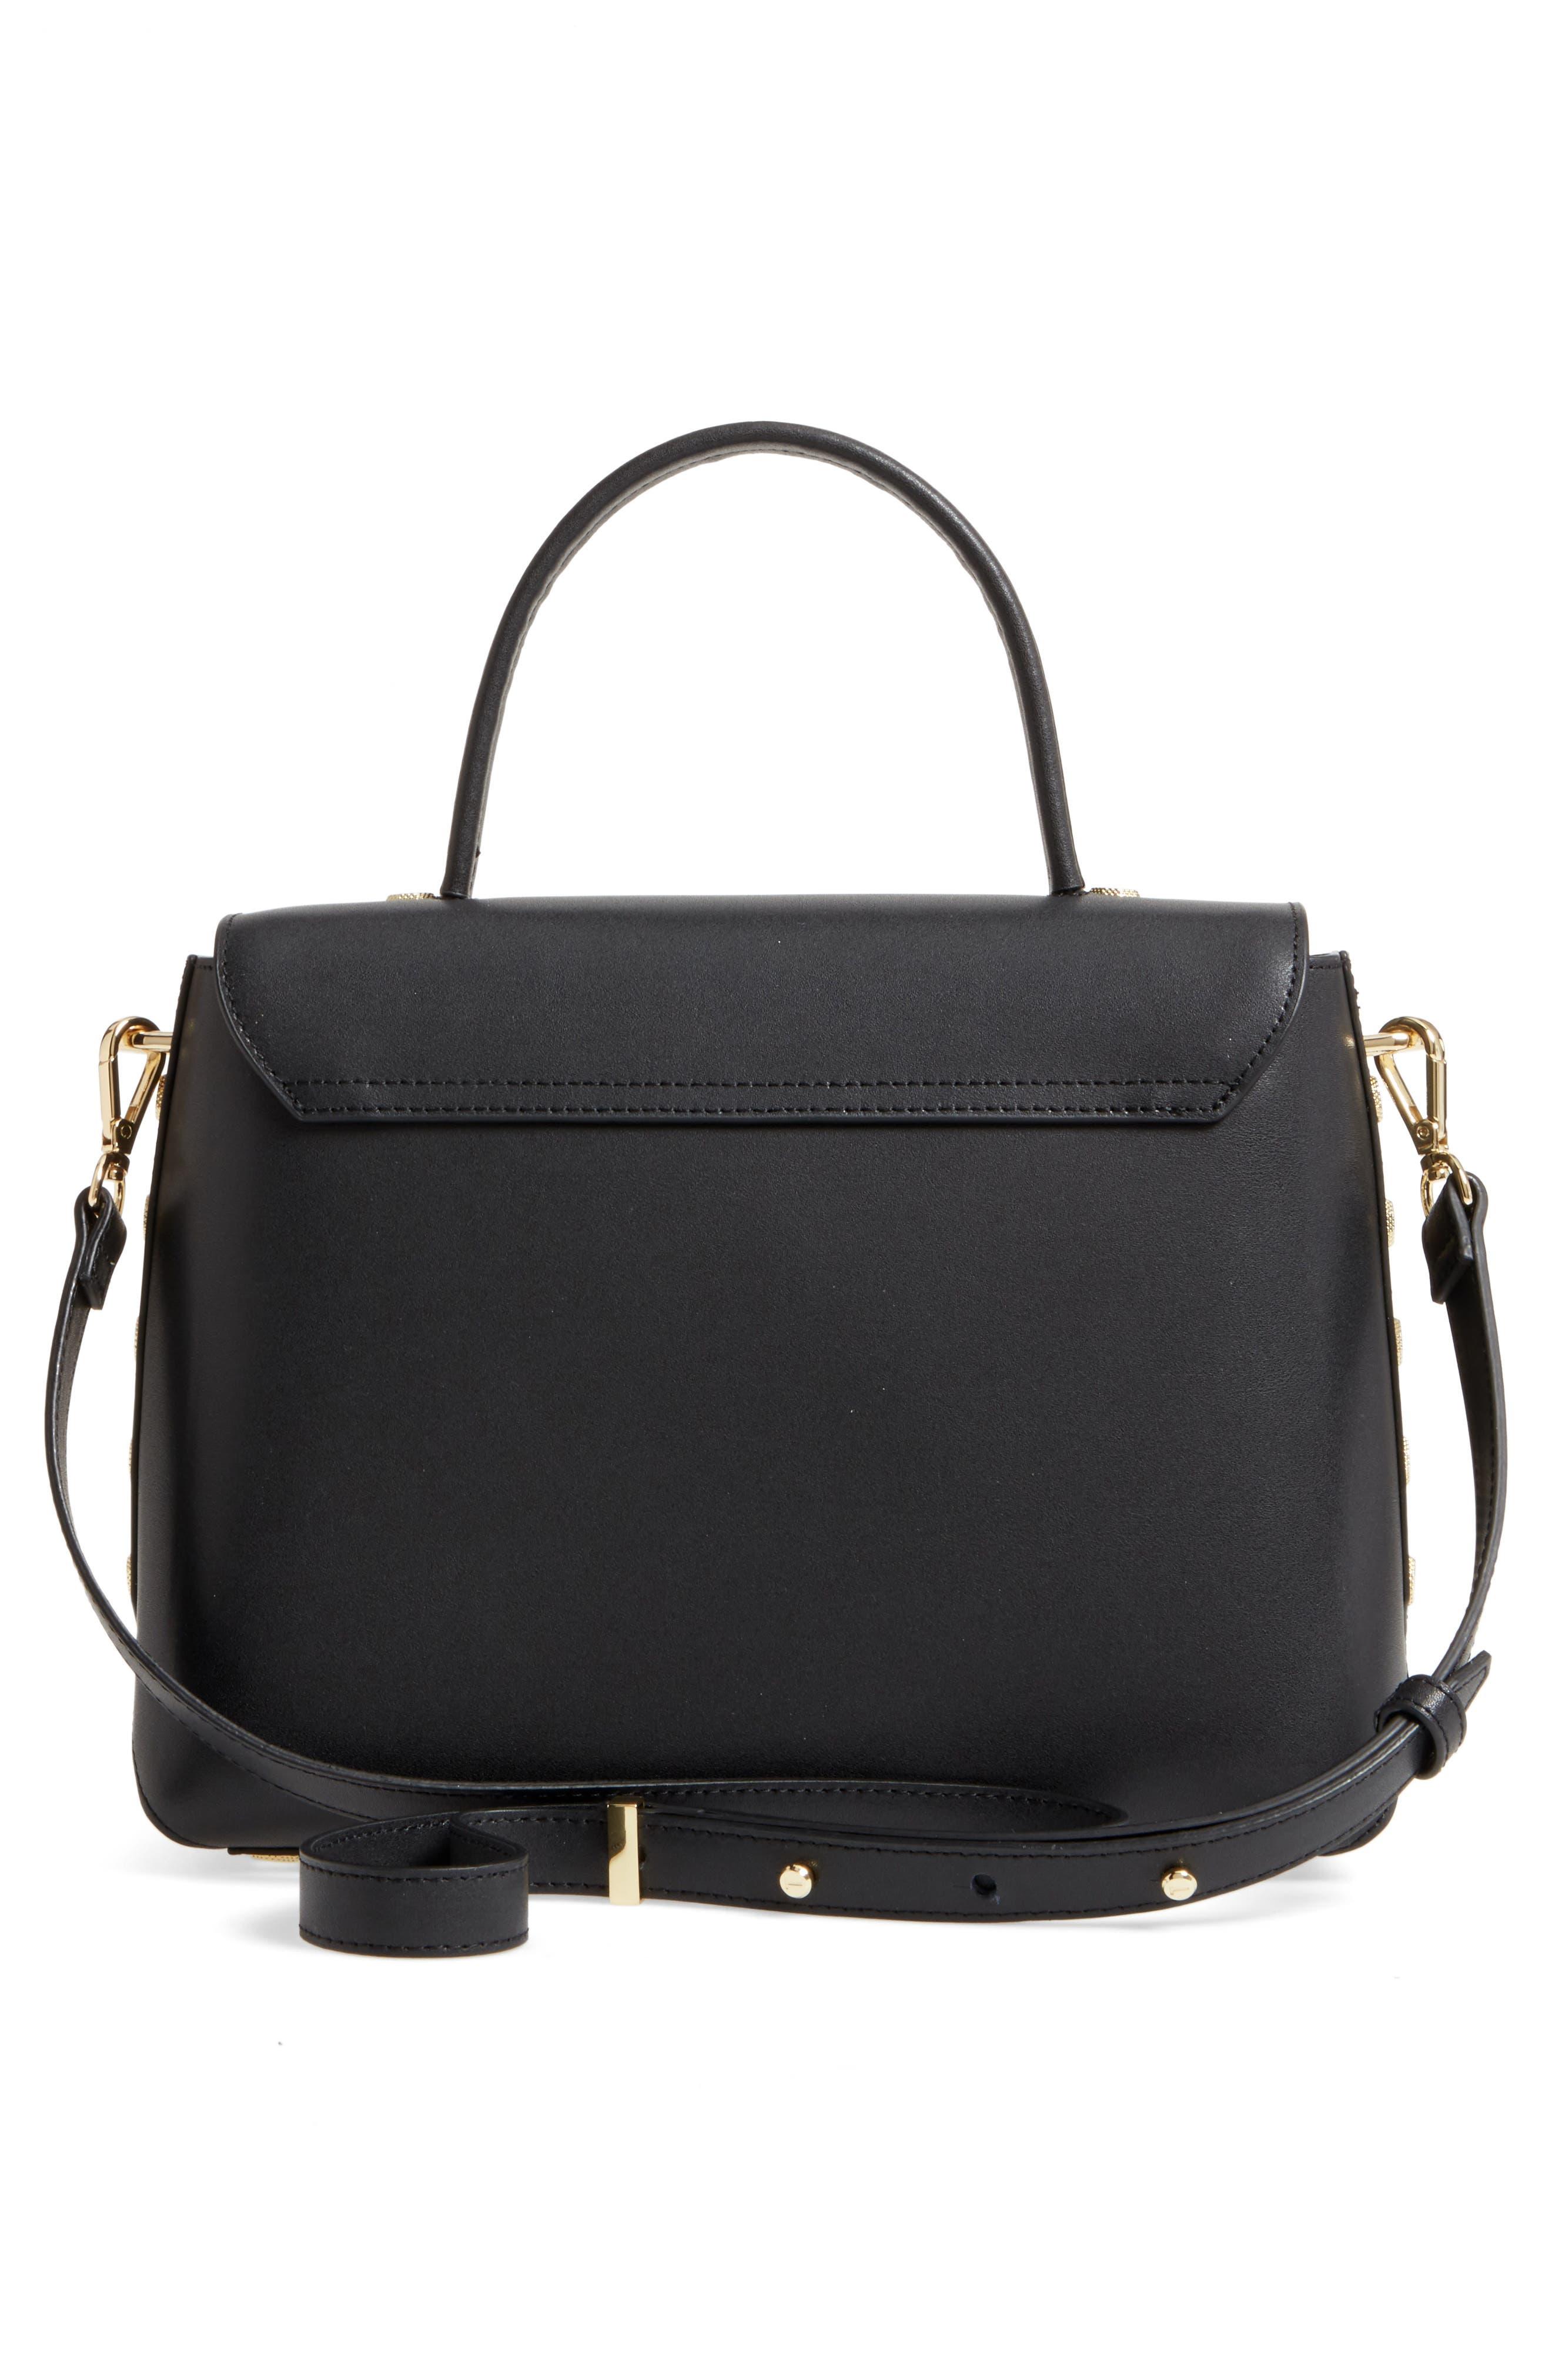 Taymar - Studded Edge Lady Bag Leather Top Handle Satchel,                             Alternate thumbnail 2, color,                             Black